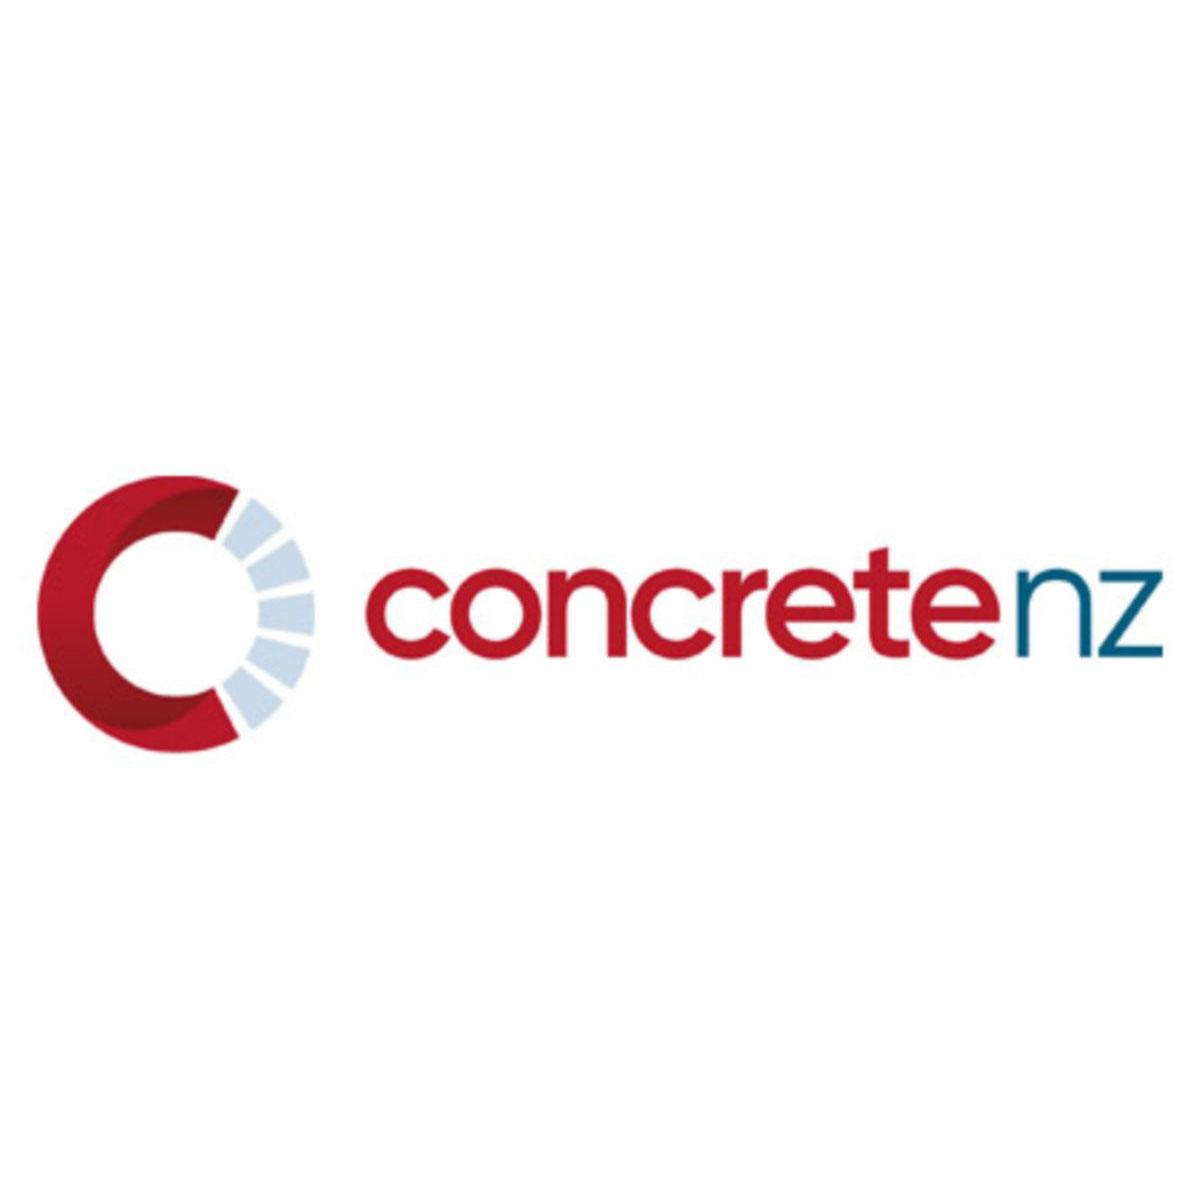 ConcreteNZ